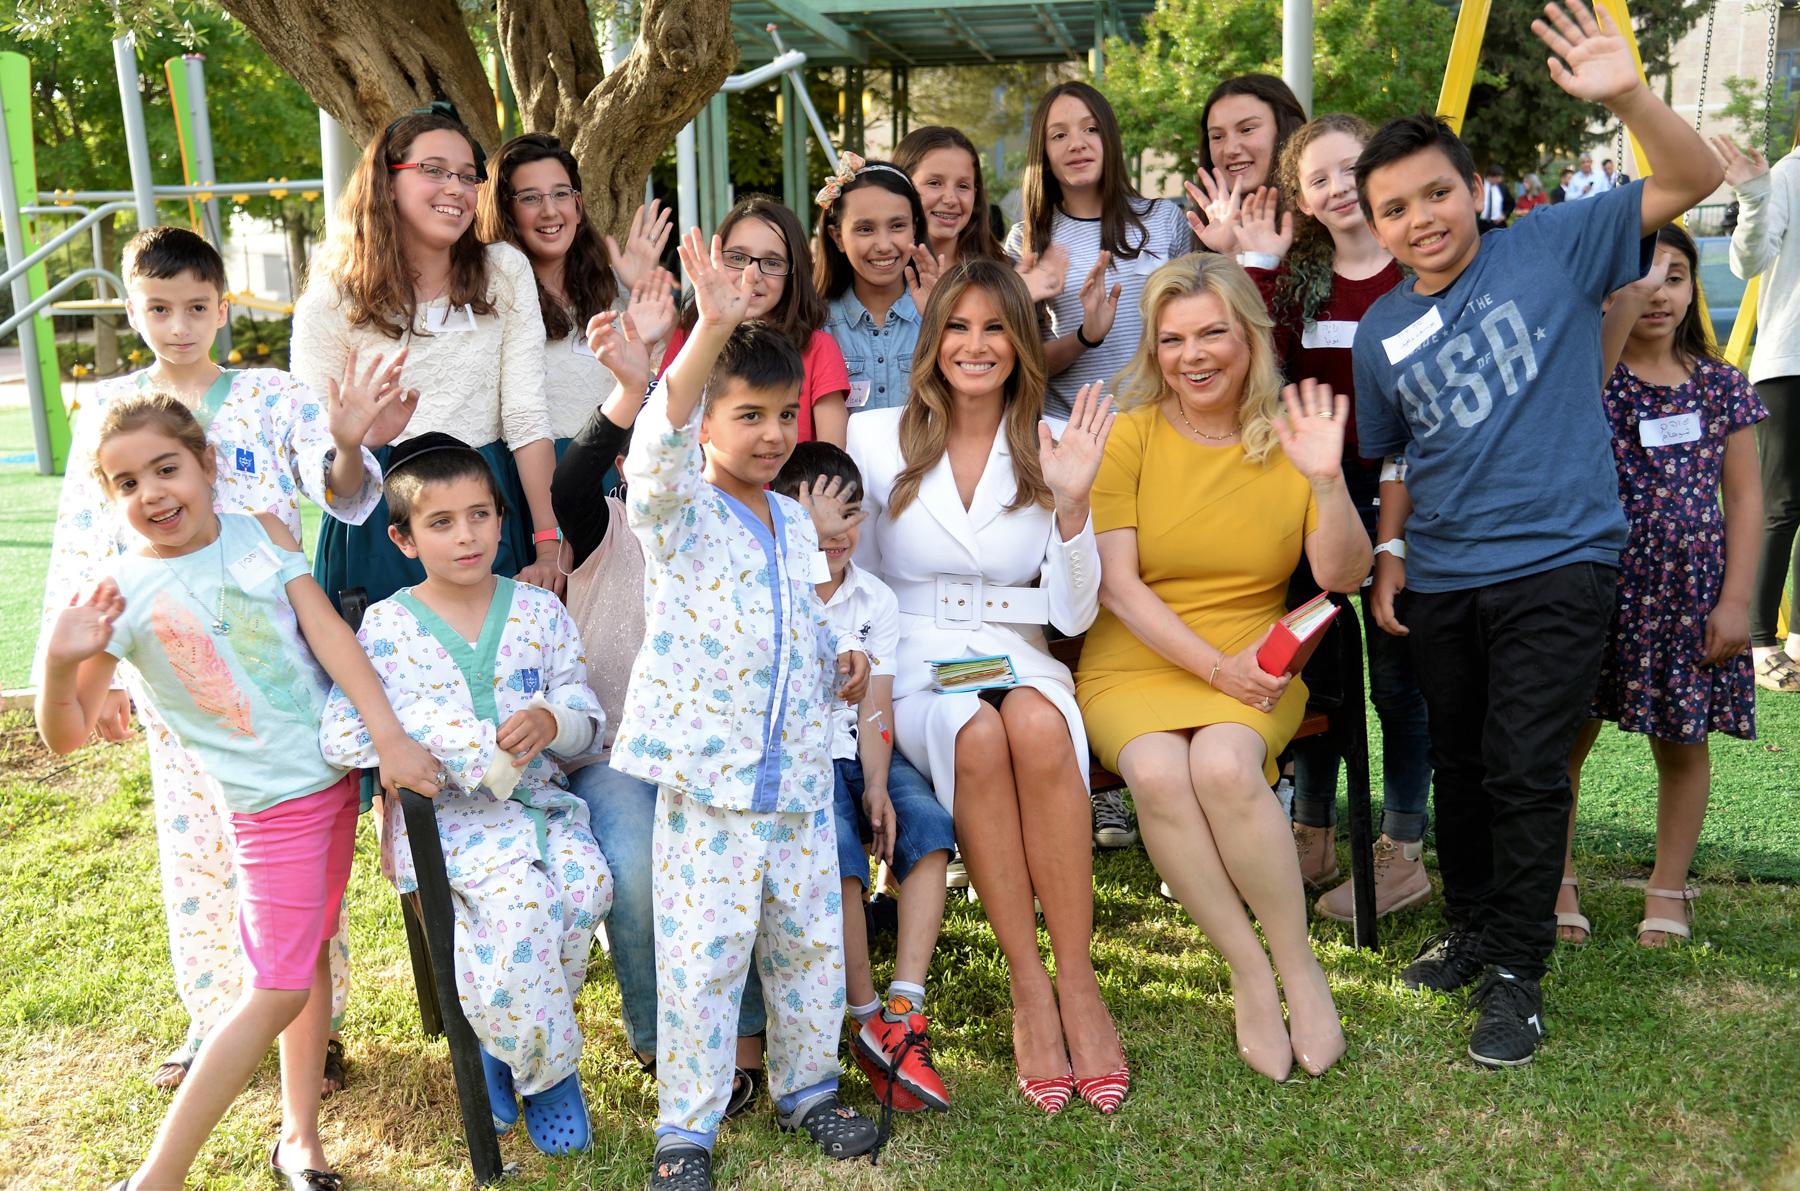 Melania Trump and Sara Netanyahu waving with children (U.S. Embassy Tel Aviv/David Azagury)